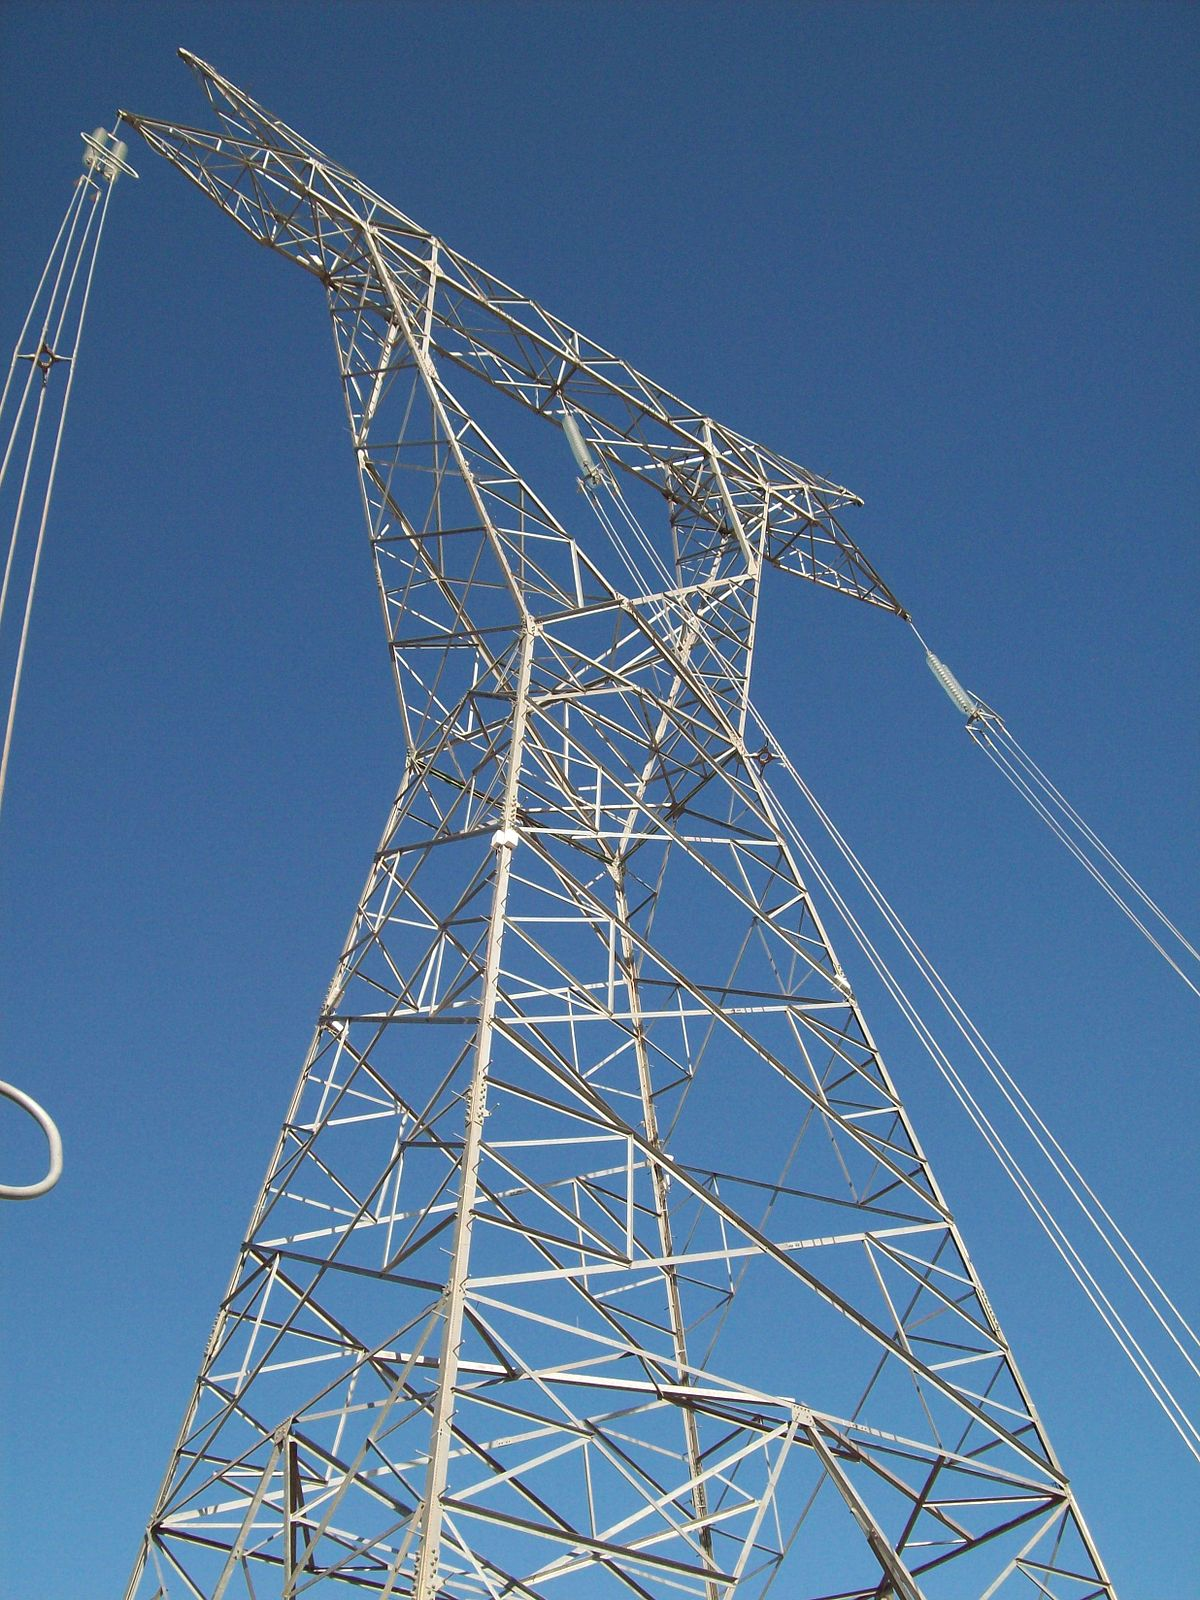 Torre eléctrica - Wikipedia, la enciclopedia libre